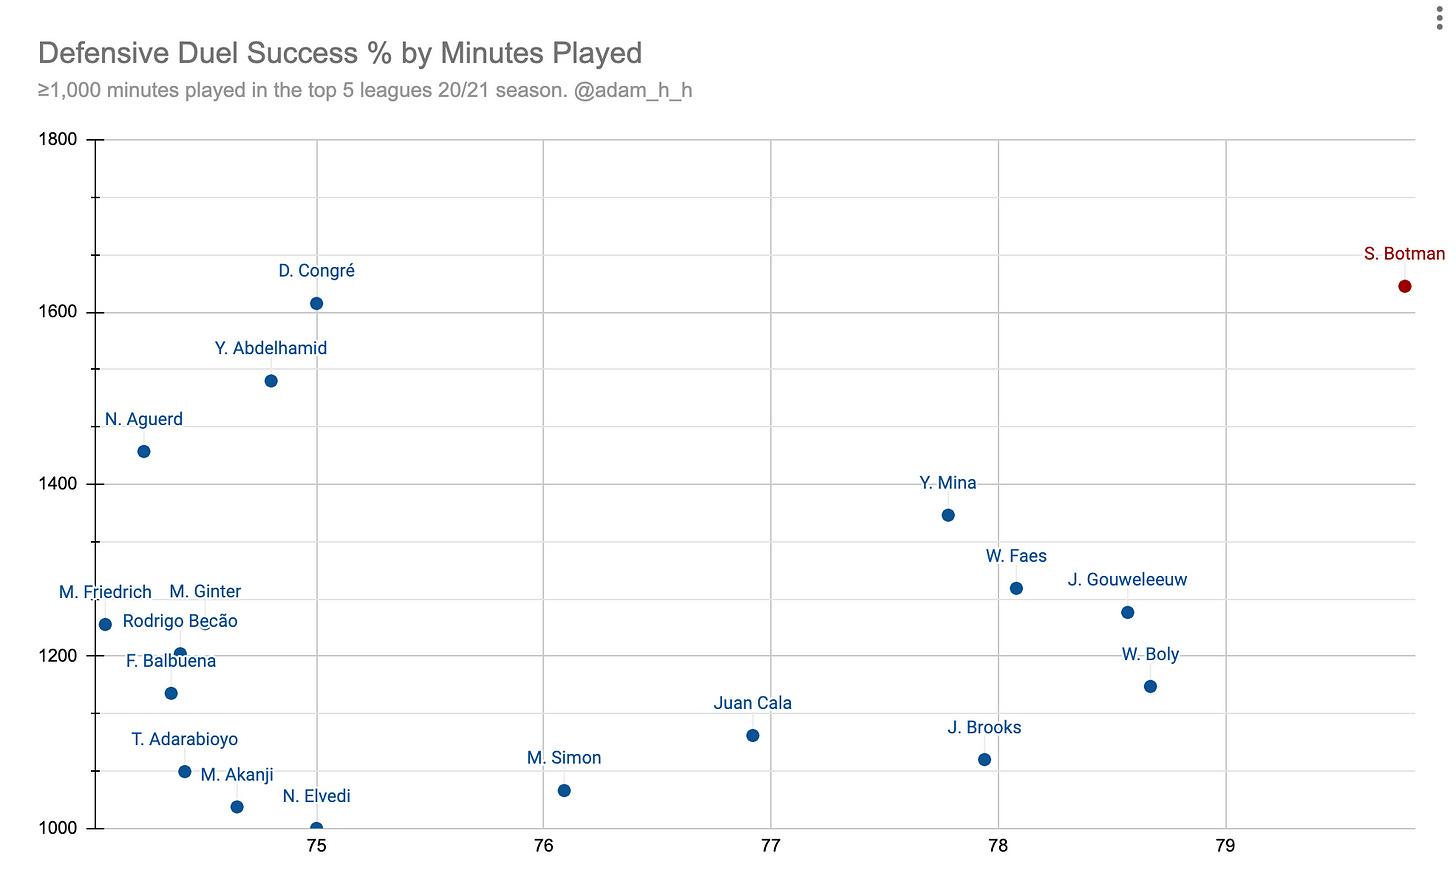 defensive dual success percentage